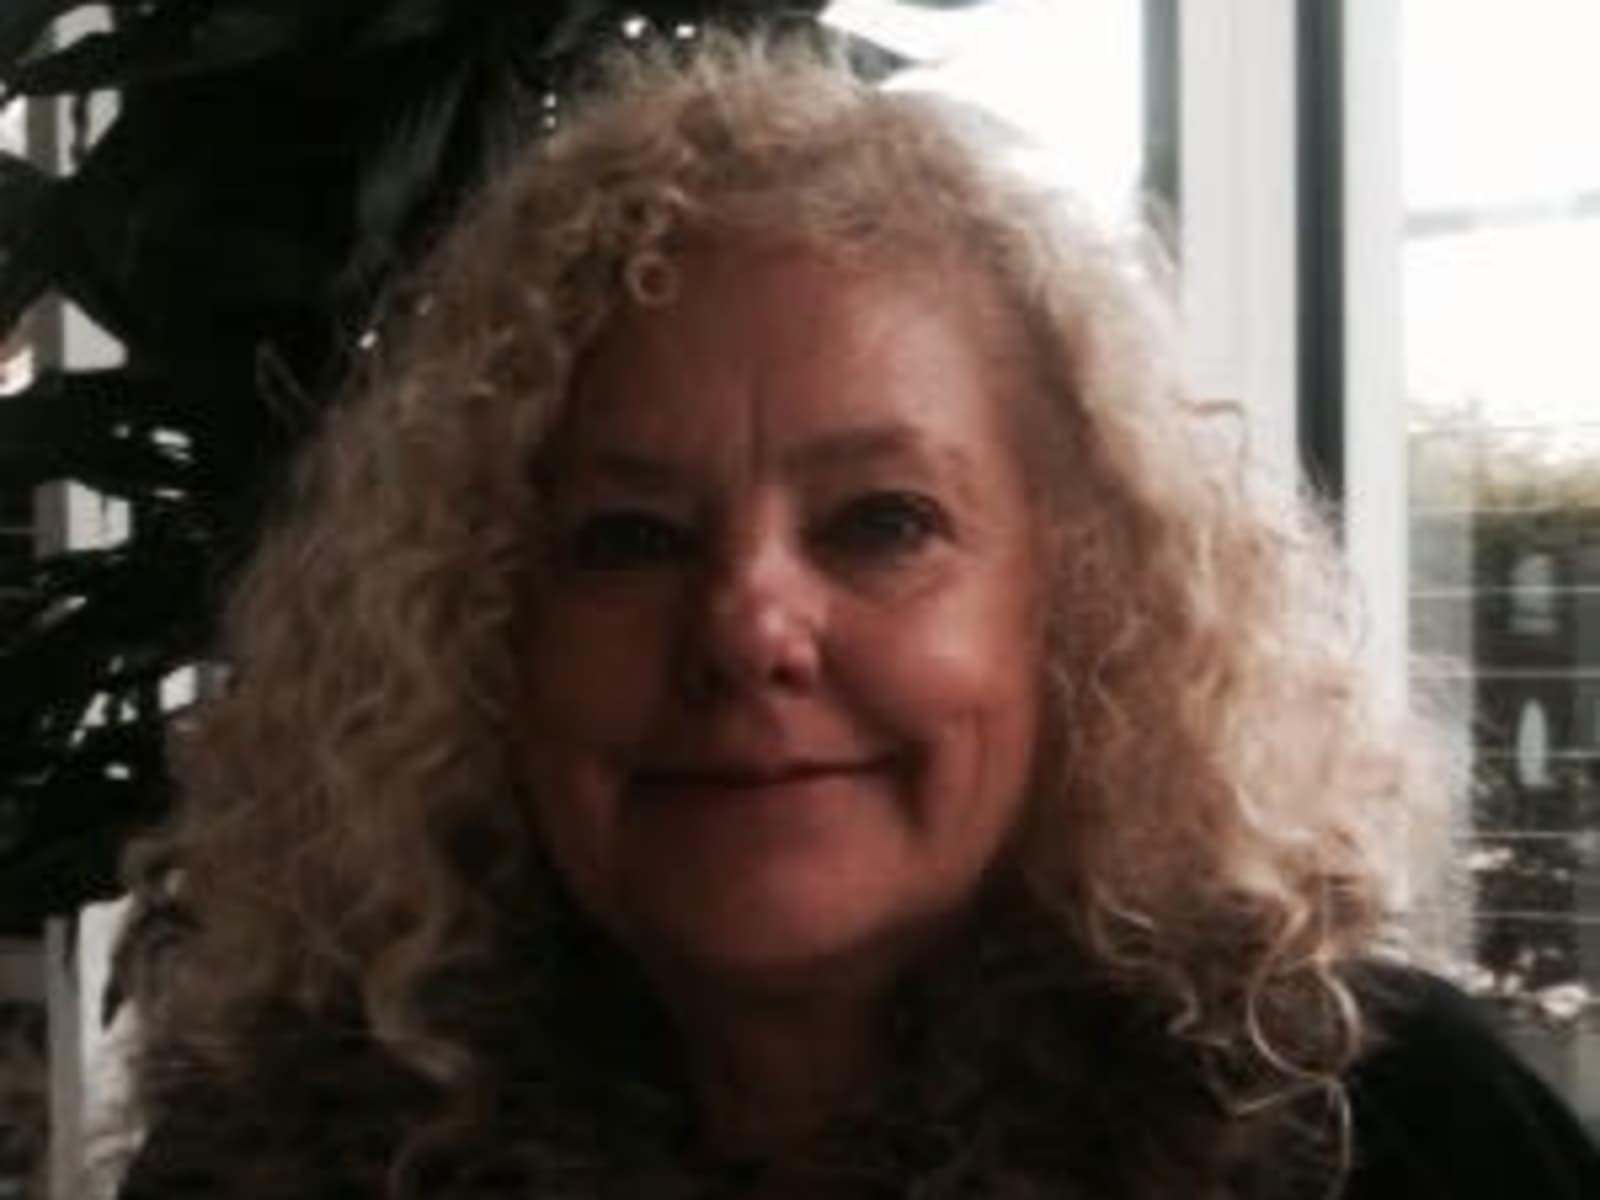 Celeste from London, United Kingdom